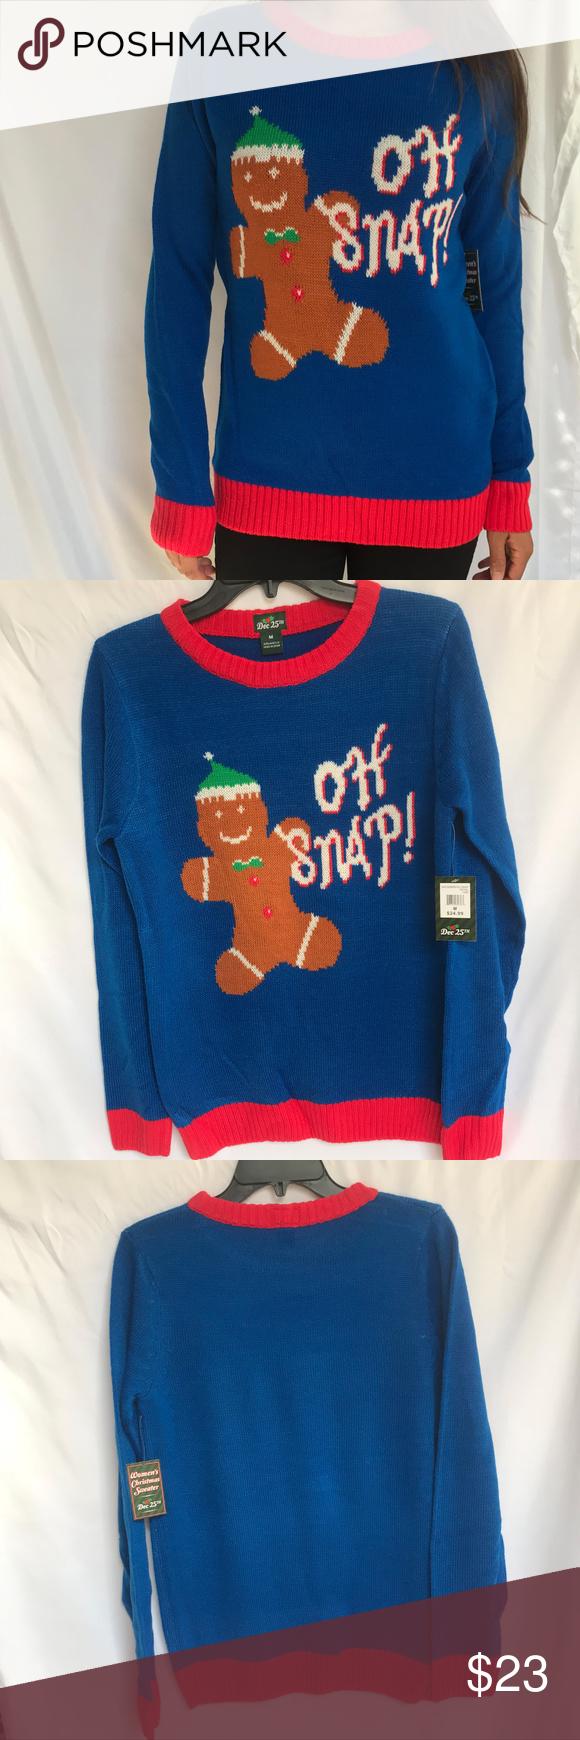 NWT Ladies Ugly Christmas Sweater - Oh Snap! NWT | Ugliest christmas ...